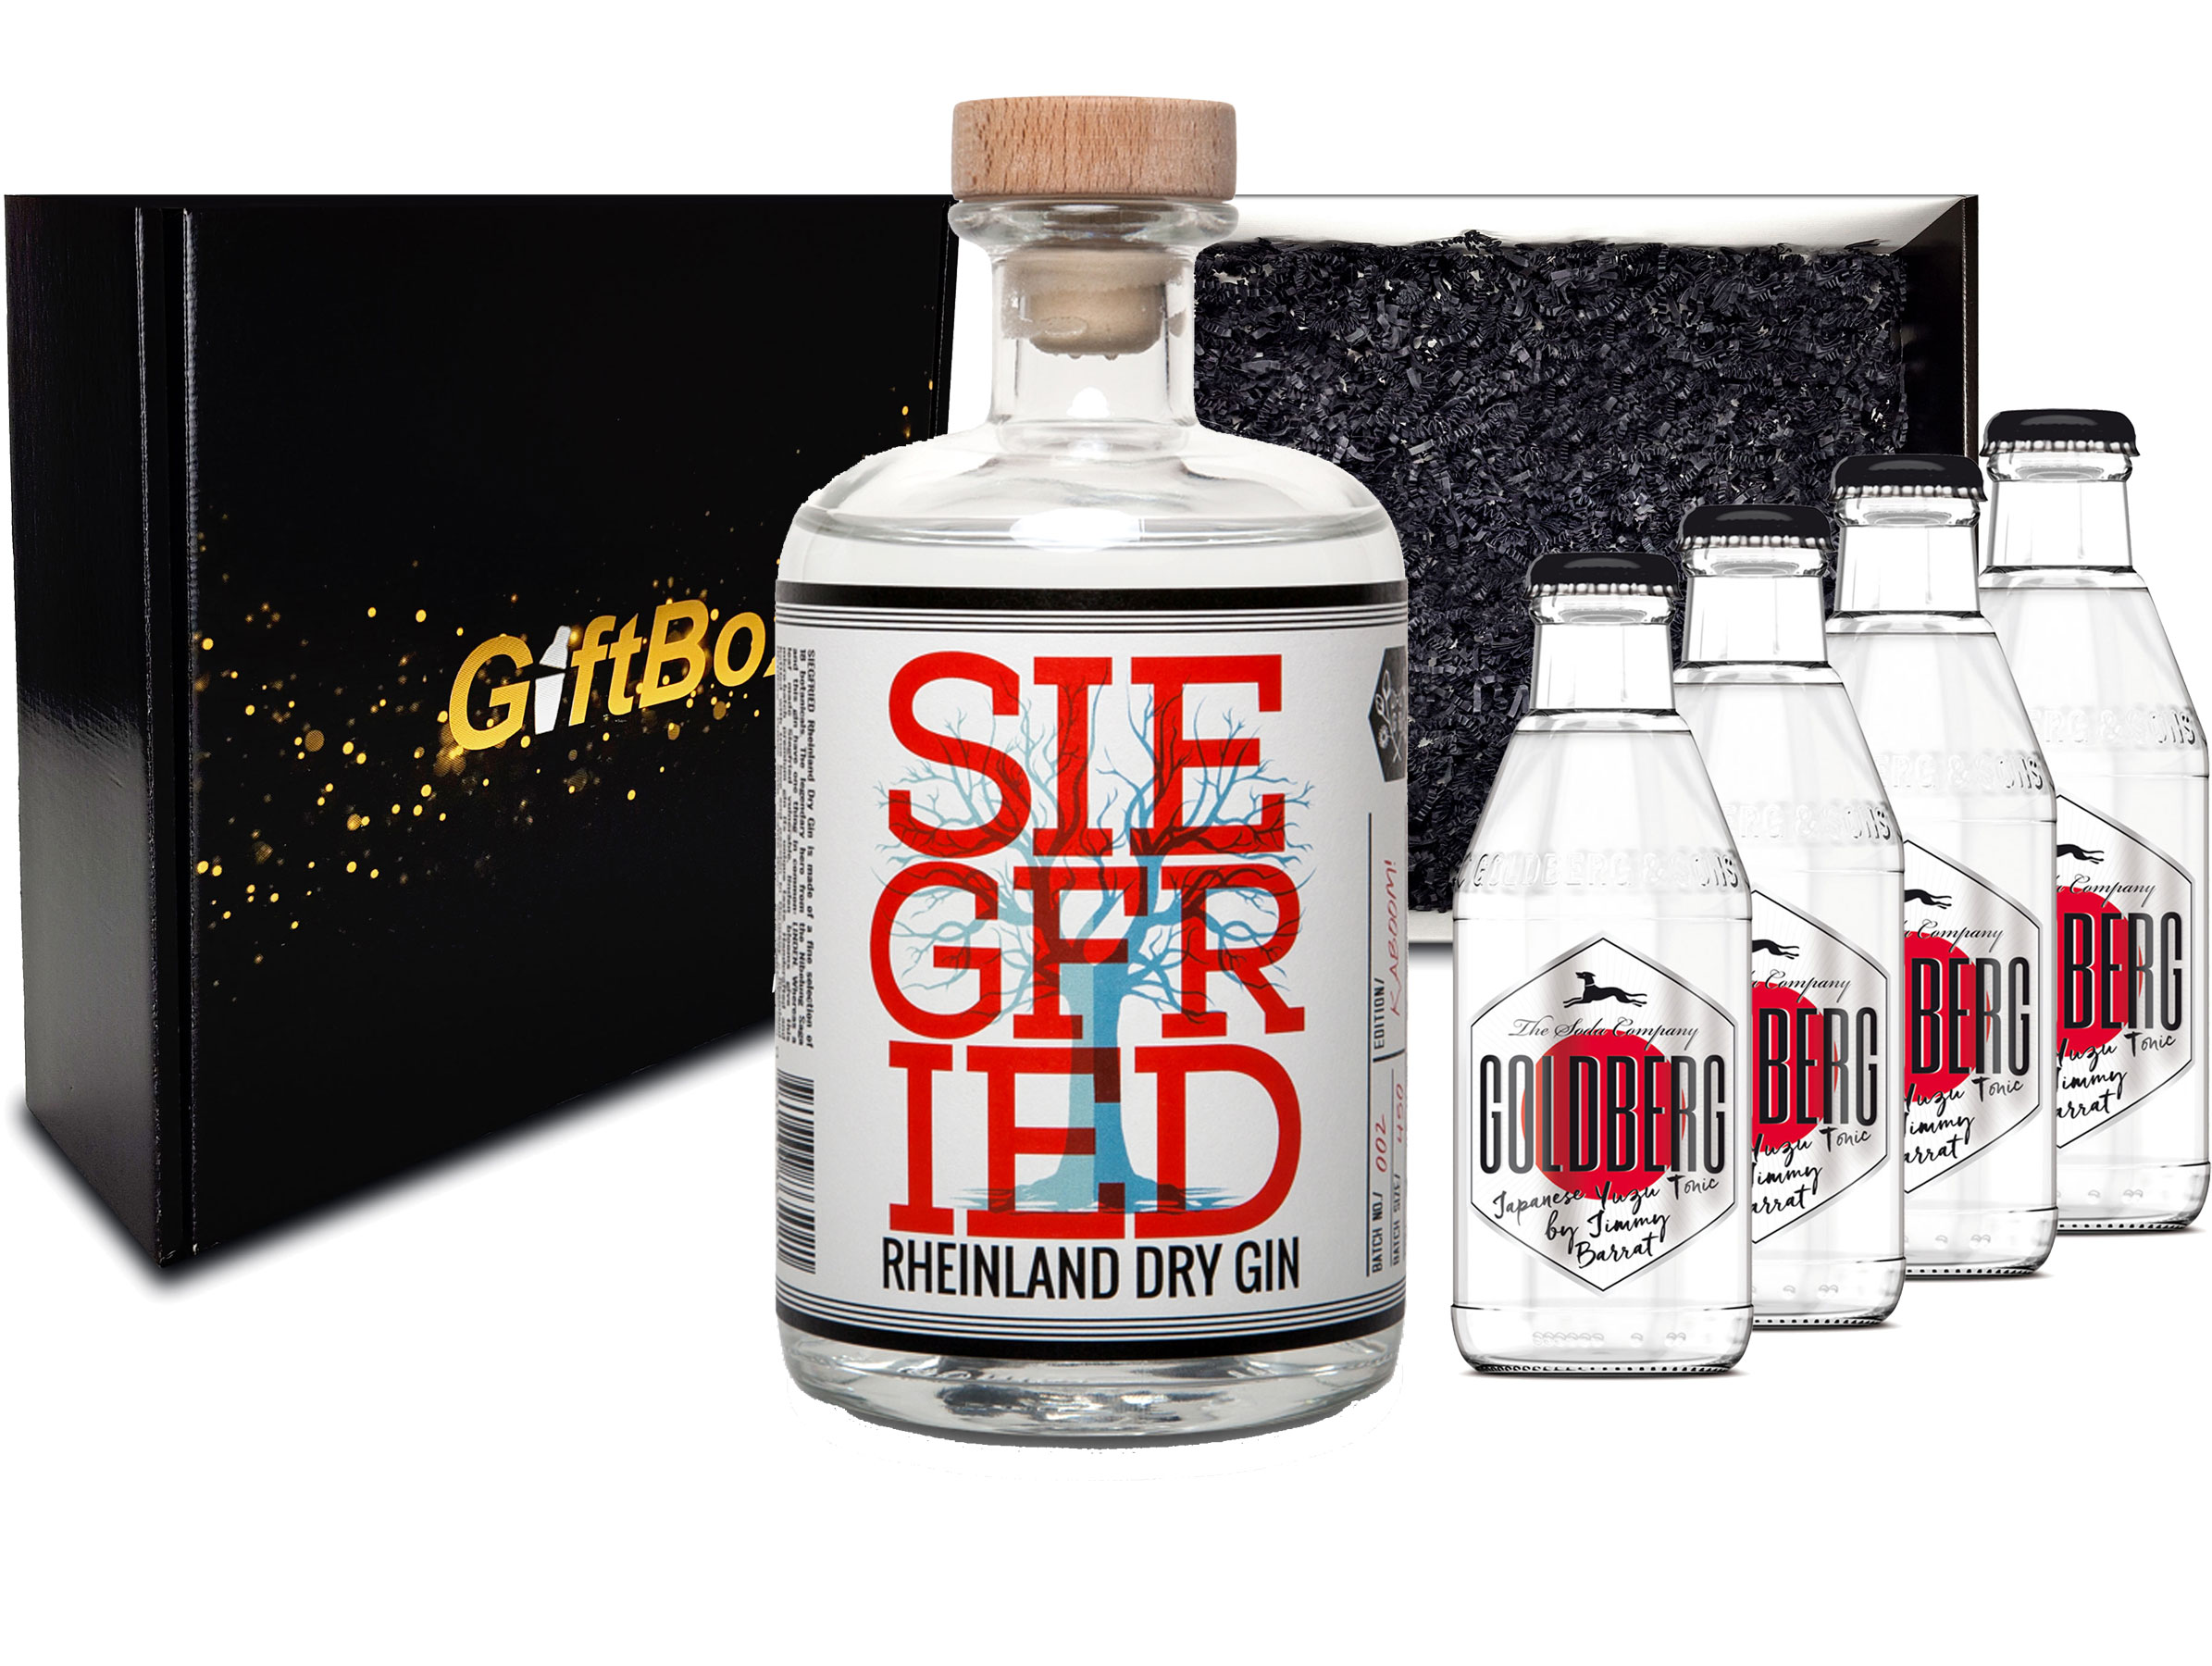 Gin Tonic Set Giftbox Geschenkset - Siegfried Rheinland Dry Gin 0,5l (41% Vol) + 4x Goldberg Japanese Yuzu Tonic Water 200ml inkl. Pfand MEHRWEG -[Enthält Sulfite]